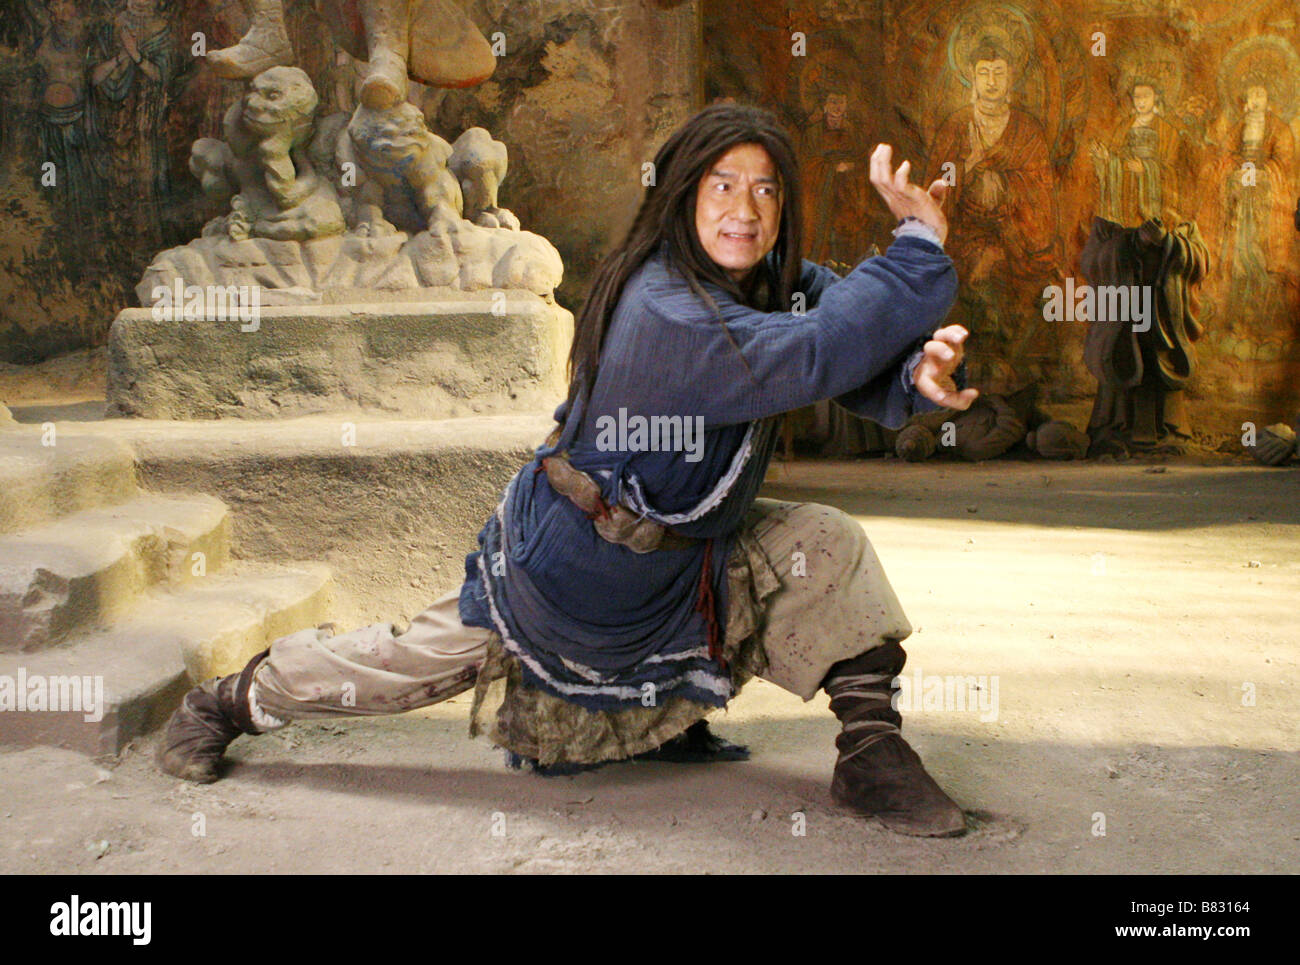 Le royaume interdit The Forbidden Kingdom  Year: 2008 - USA Jackie Chan  Director: Rob Minkoff - Stock Image